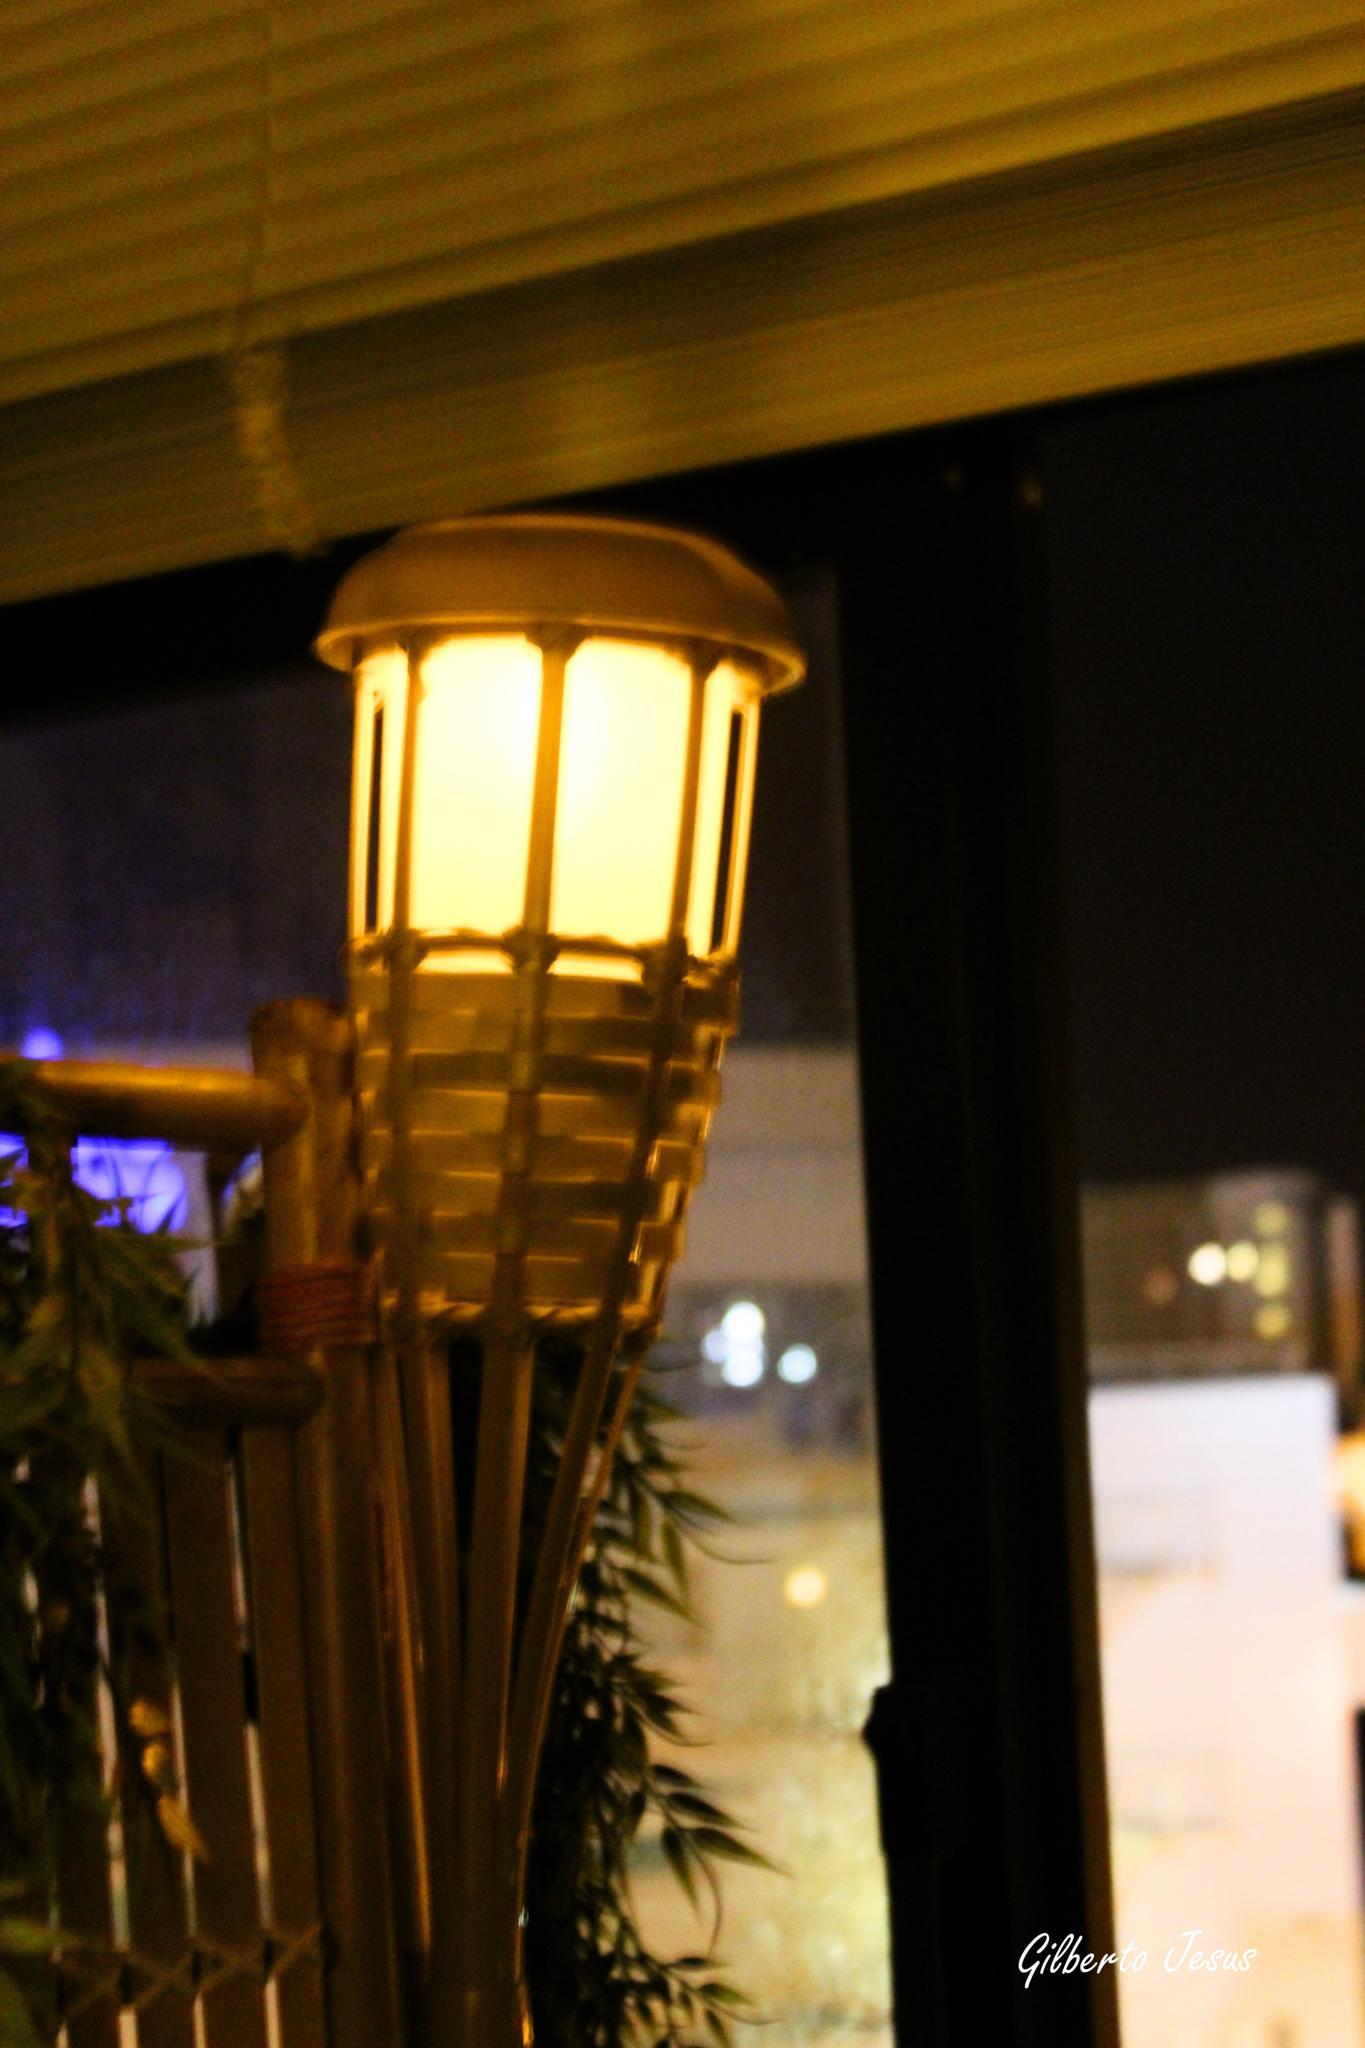 Lamp by Gilberto Jesus